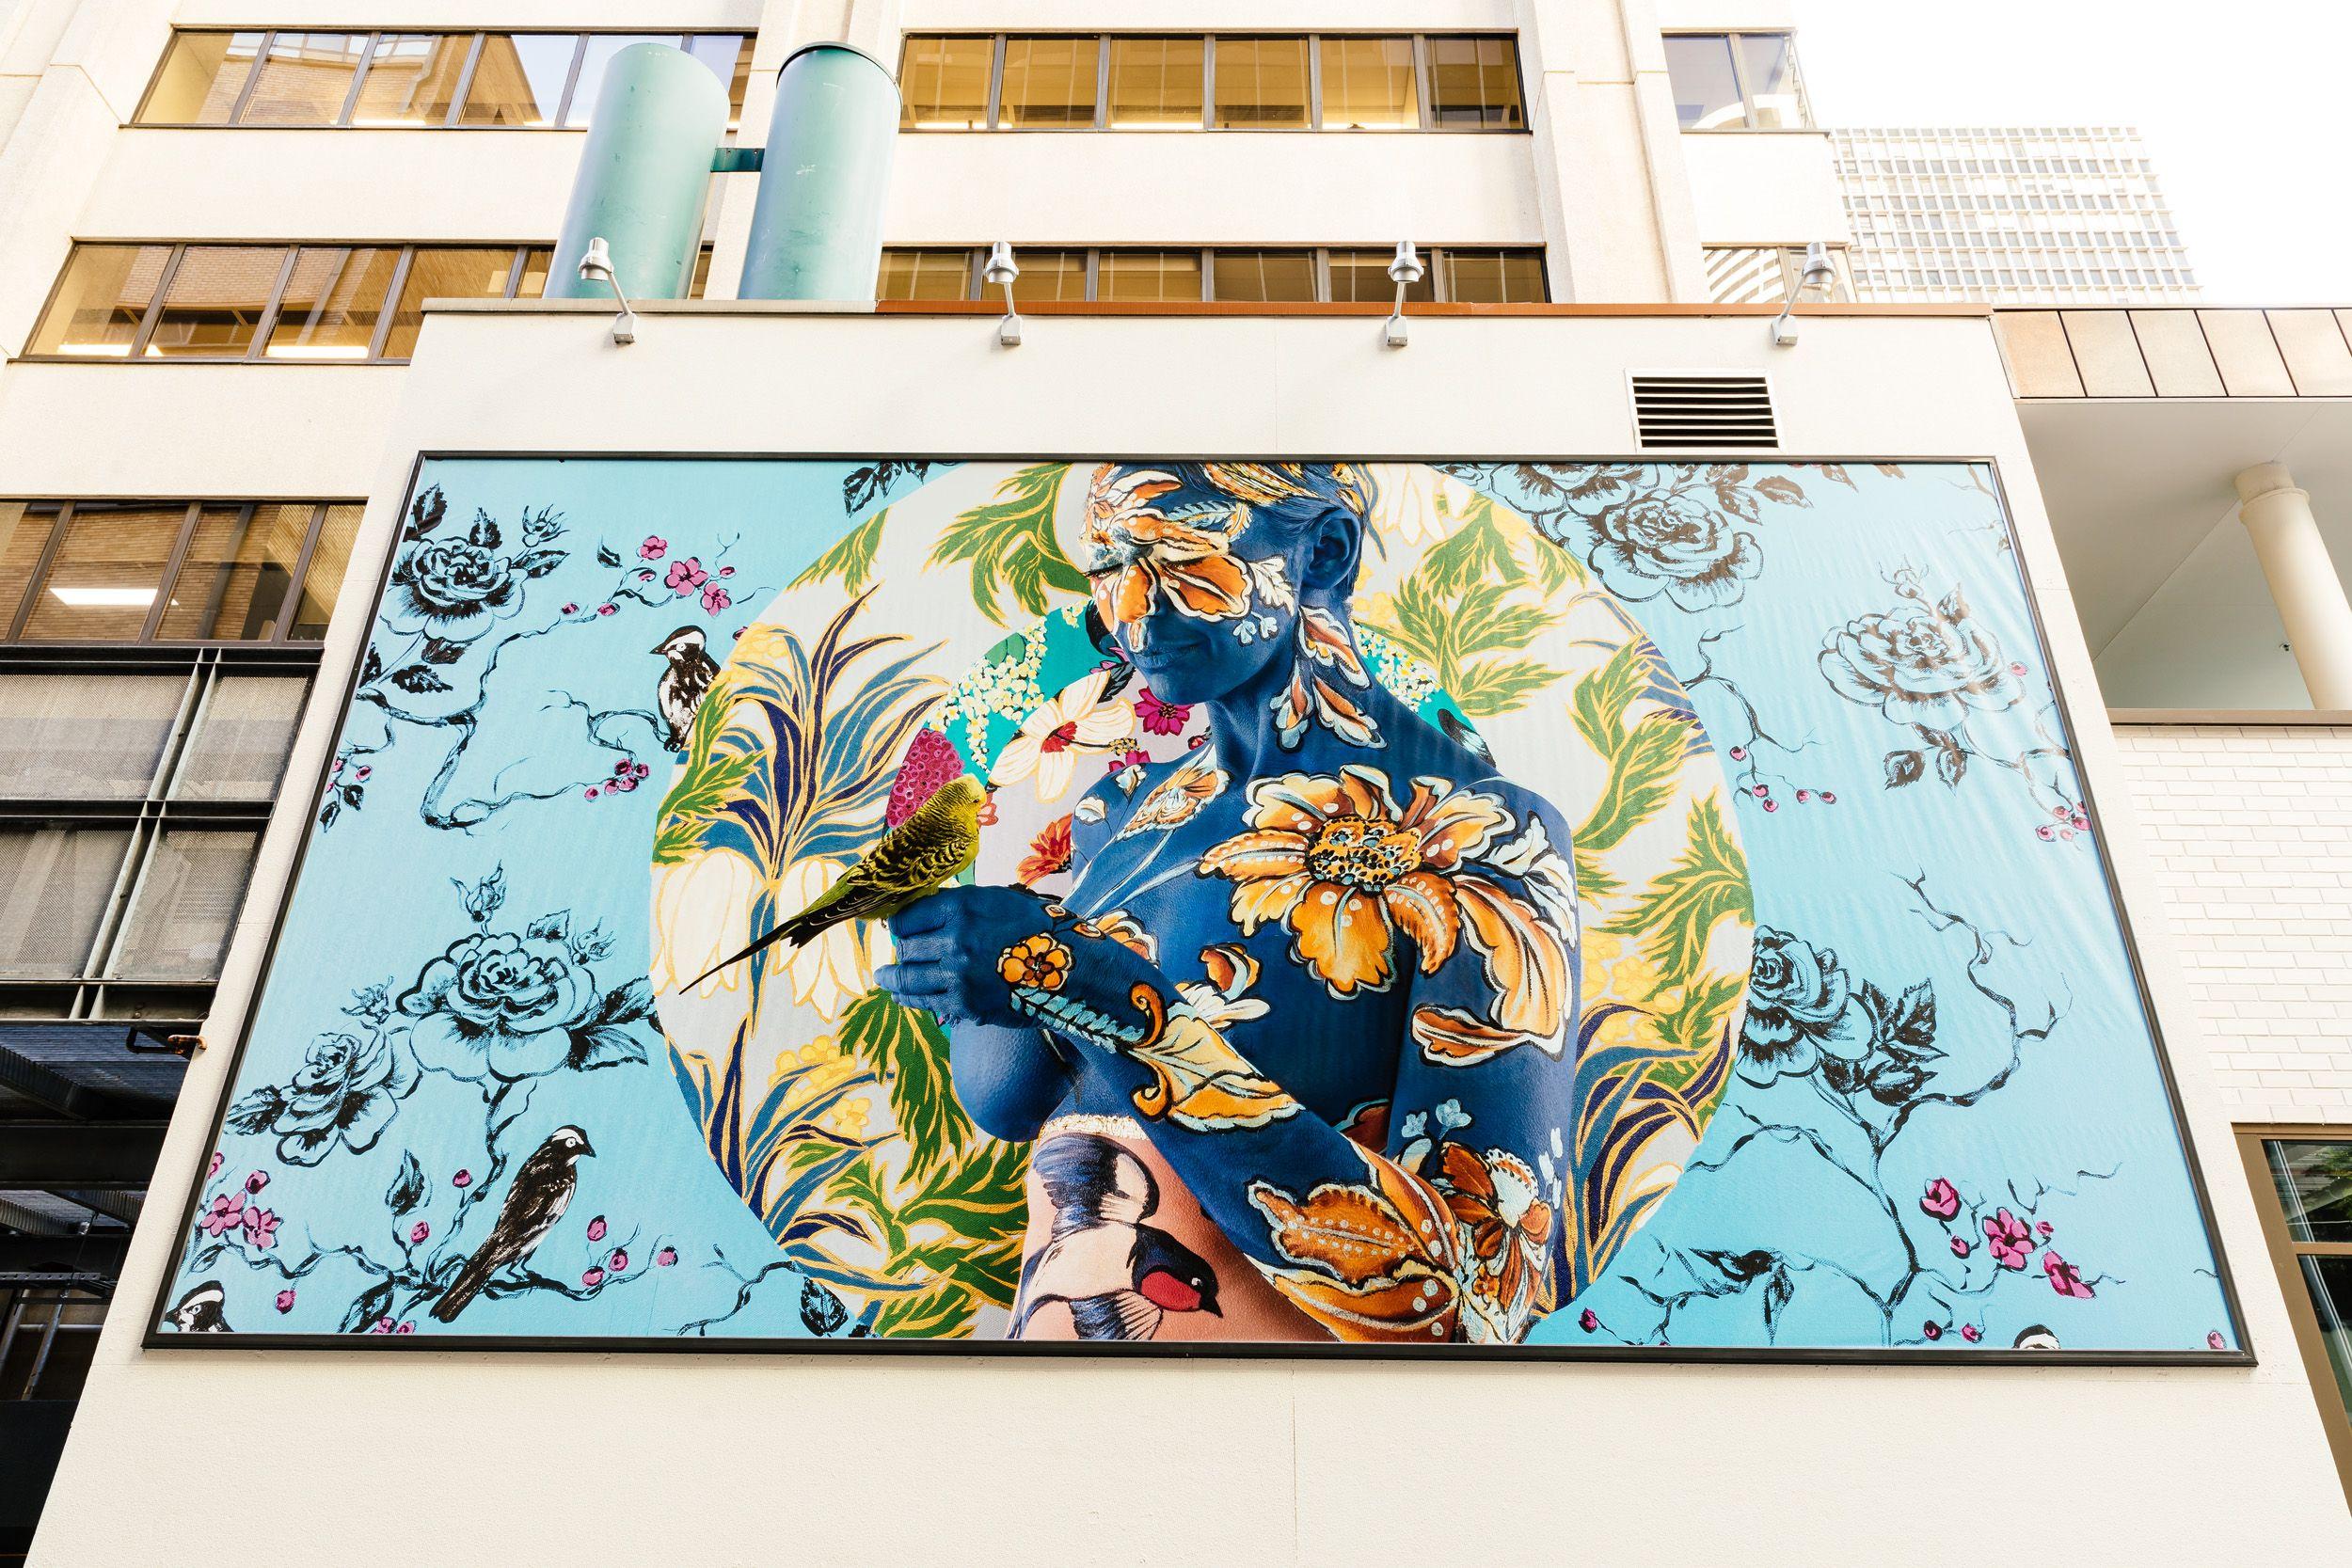 Brisbane's Newest Outdoor Gallery: Springfinity